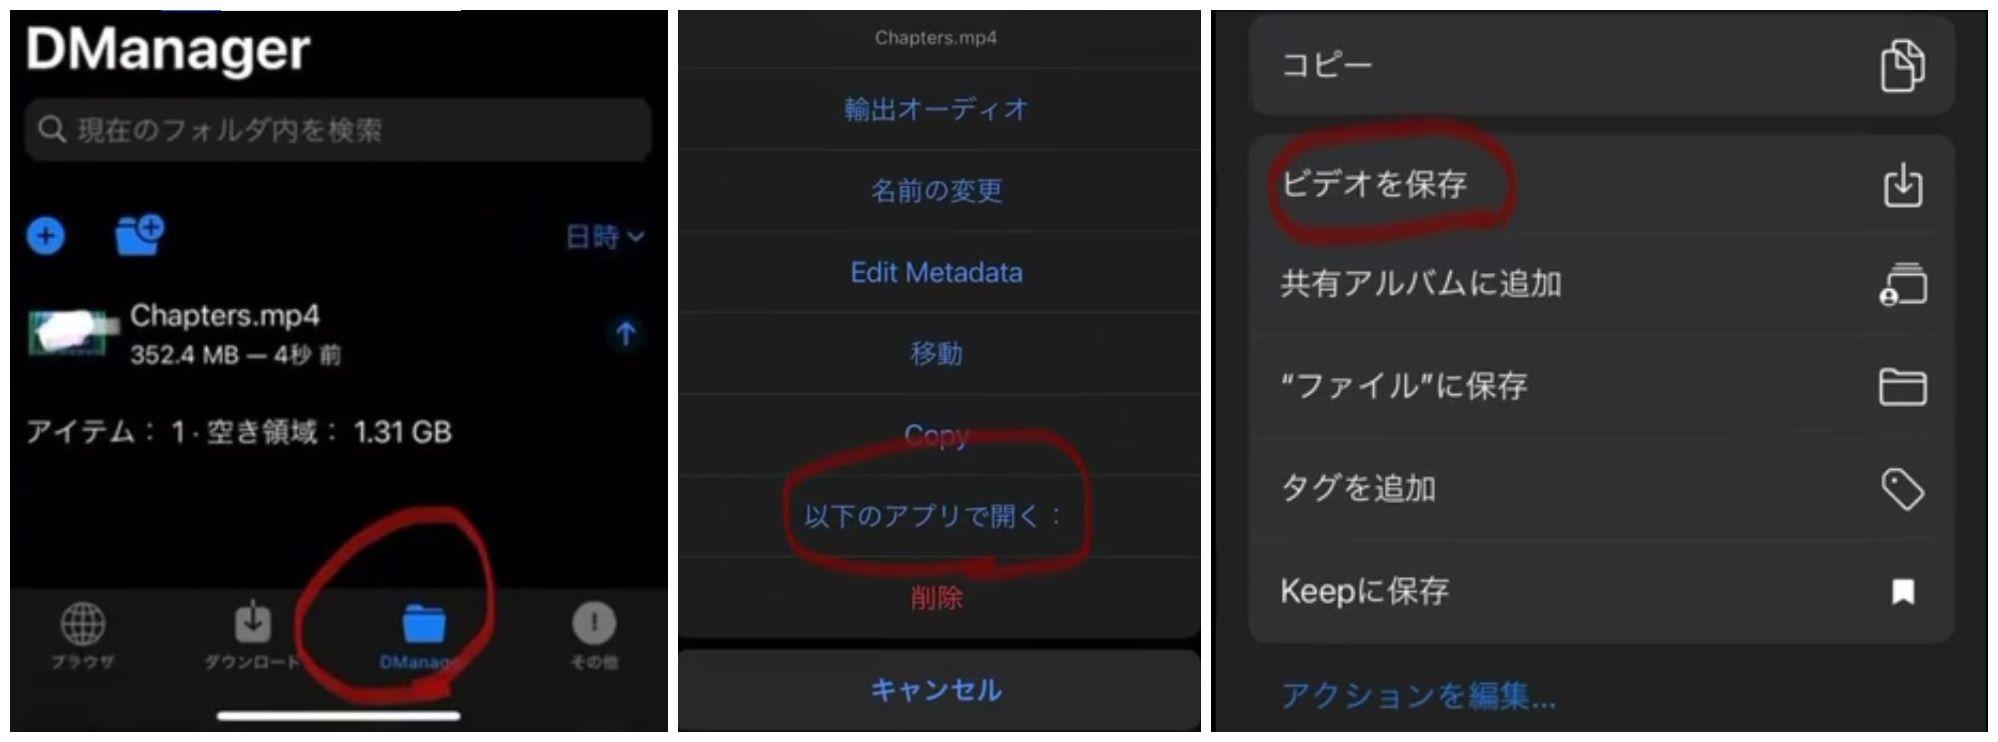 DManager FC動画保存